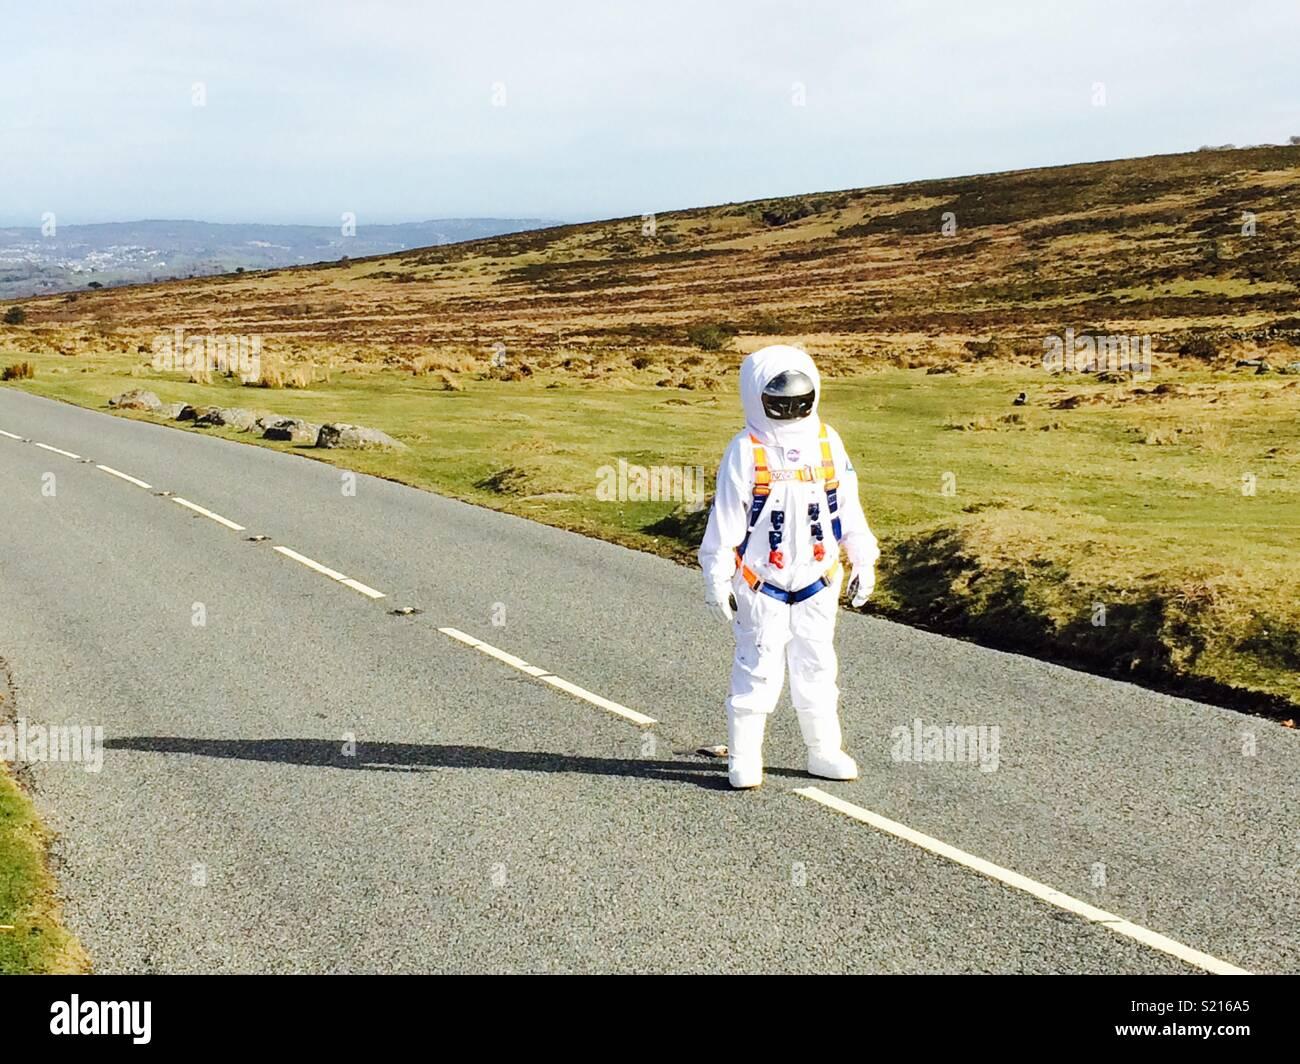 Astronauta in strada Immagini Stock